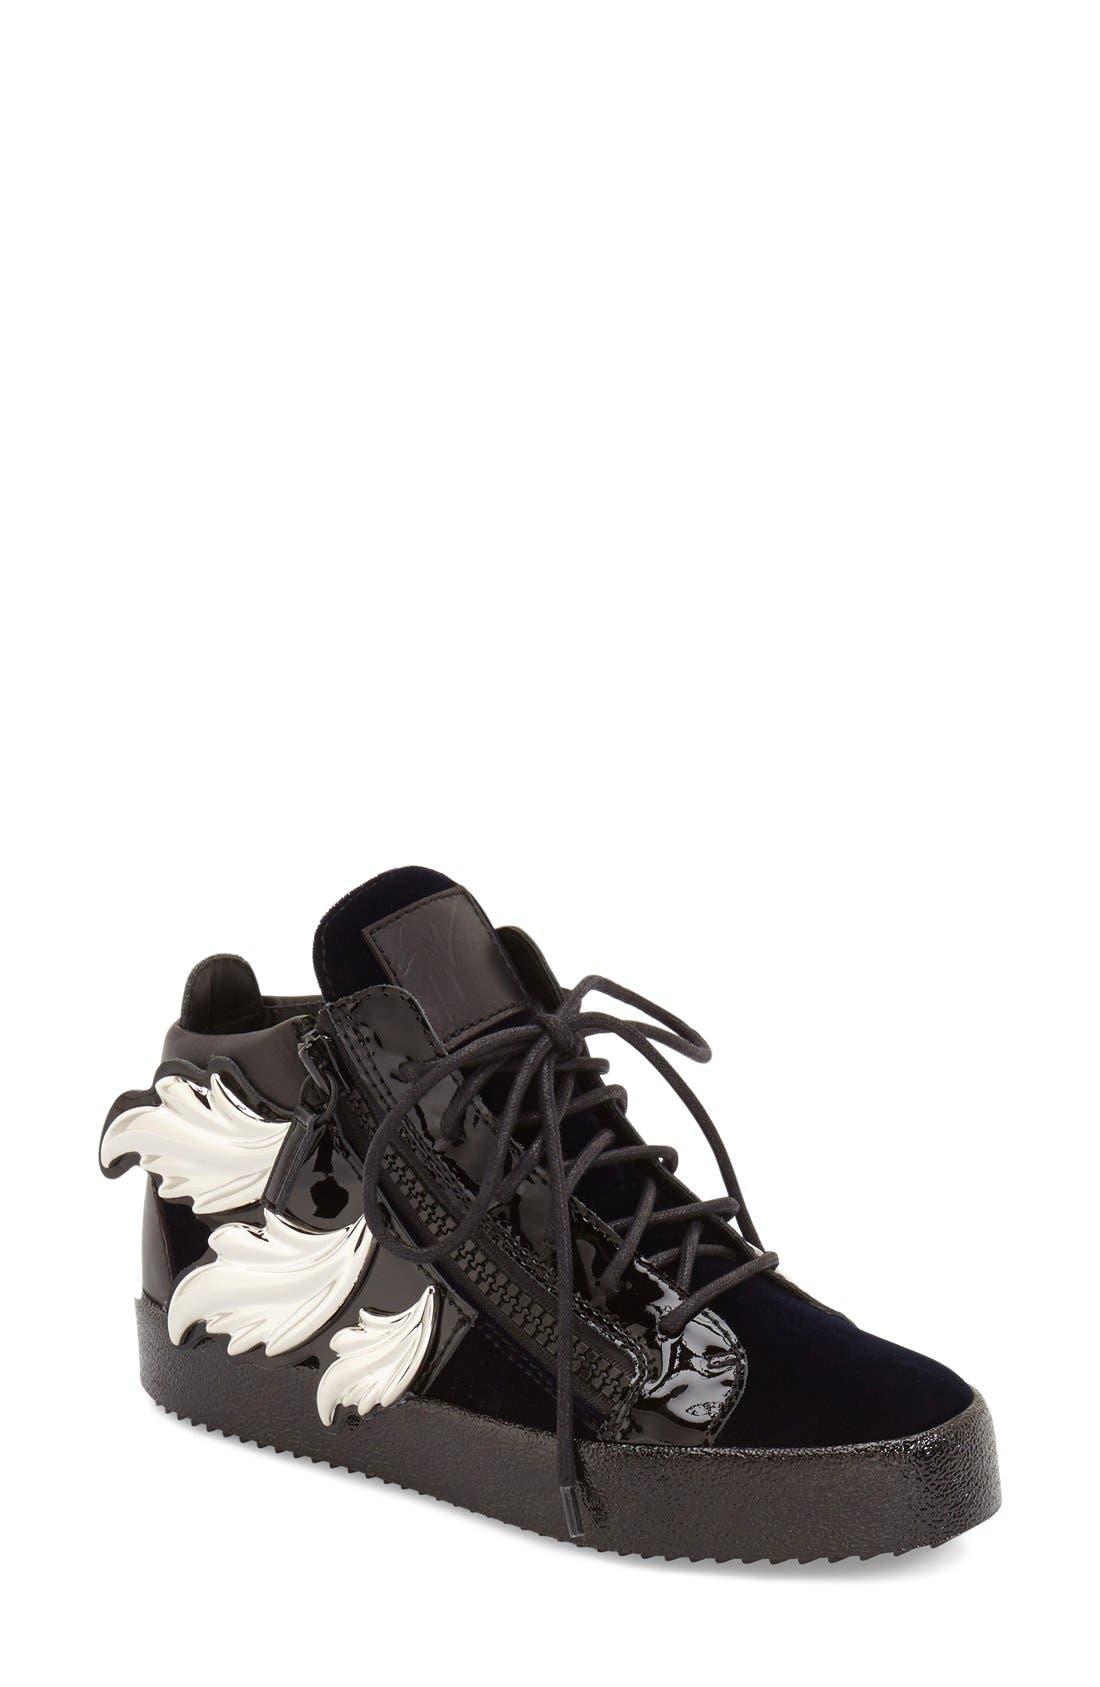 Alternate Image 1 Selected - Giuseppe Zanotti 'May London' High Top Sneaker (Women)